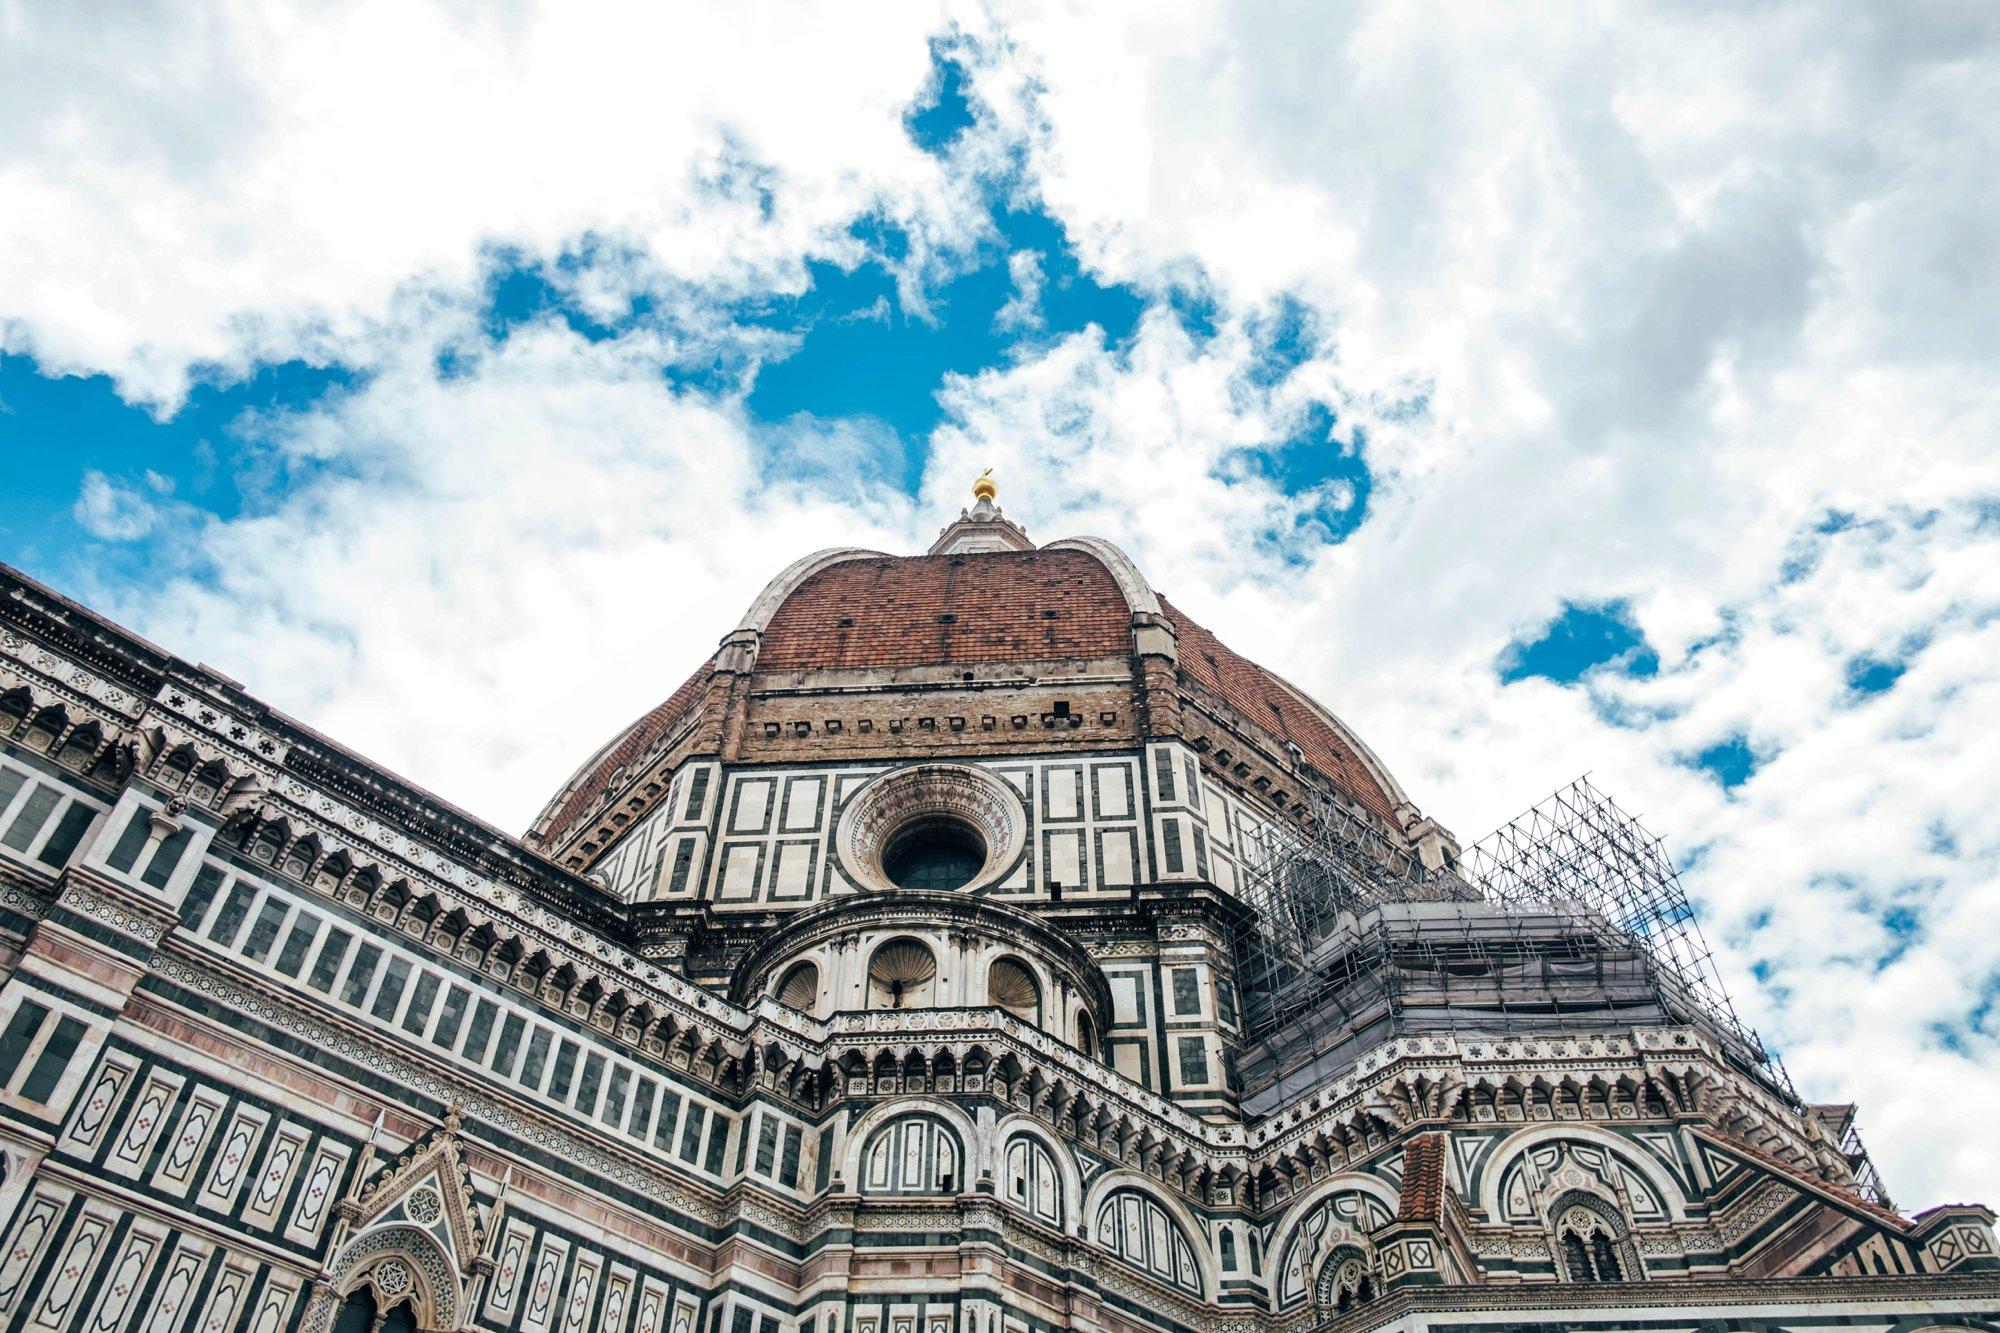 The Duomo Florence Italy Essex Documentary Wedding Travel Photographer